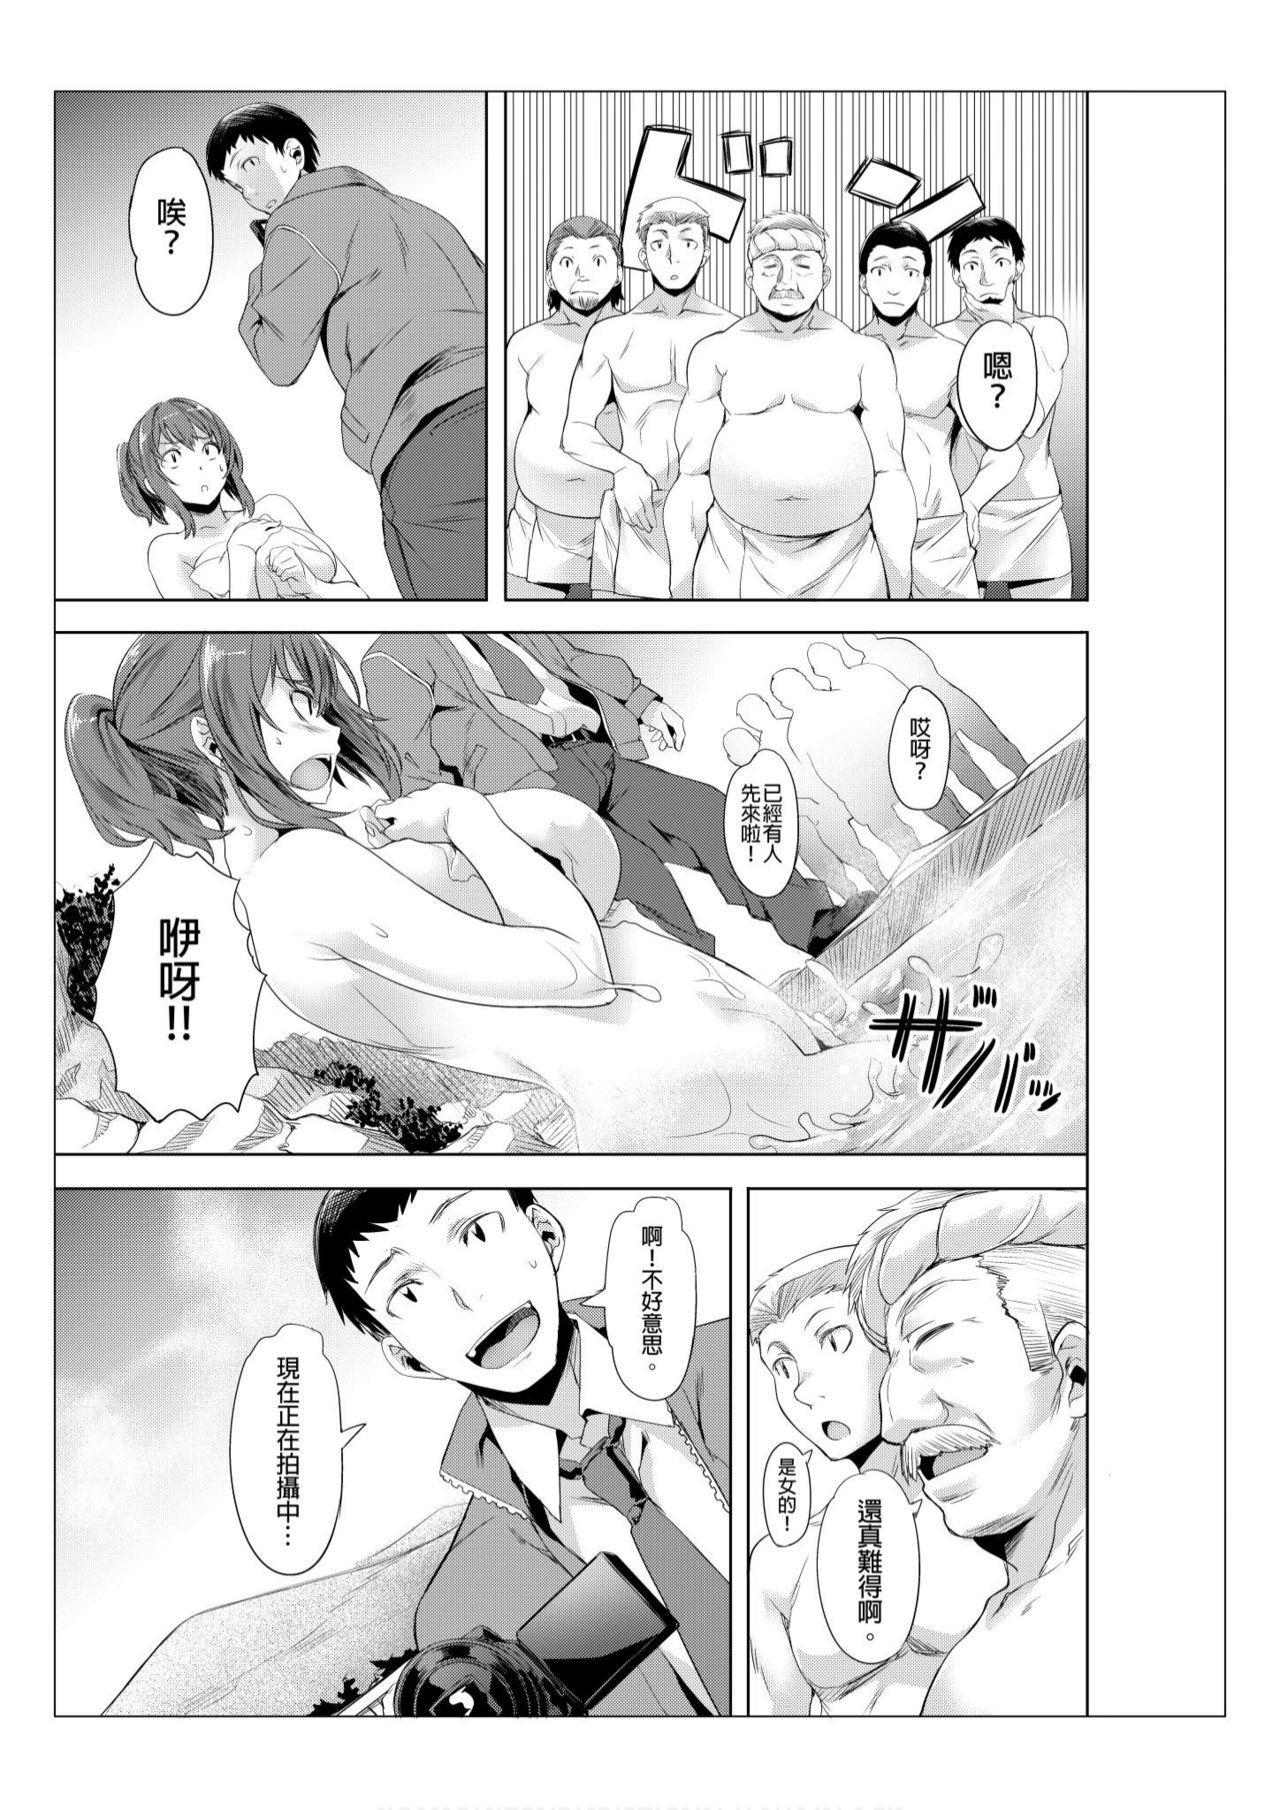 [Nagayori] Towel Ichimai de Otoko Buro.~ Shiranai Ojisan-tachi to Honiki Sex ~ | 只裹了條小毛巾就進男浴池的我。~被完全不認識的大叔們弄到高潮了~ [Chinese] [Decensored] 11